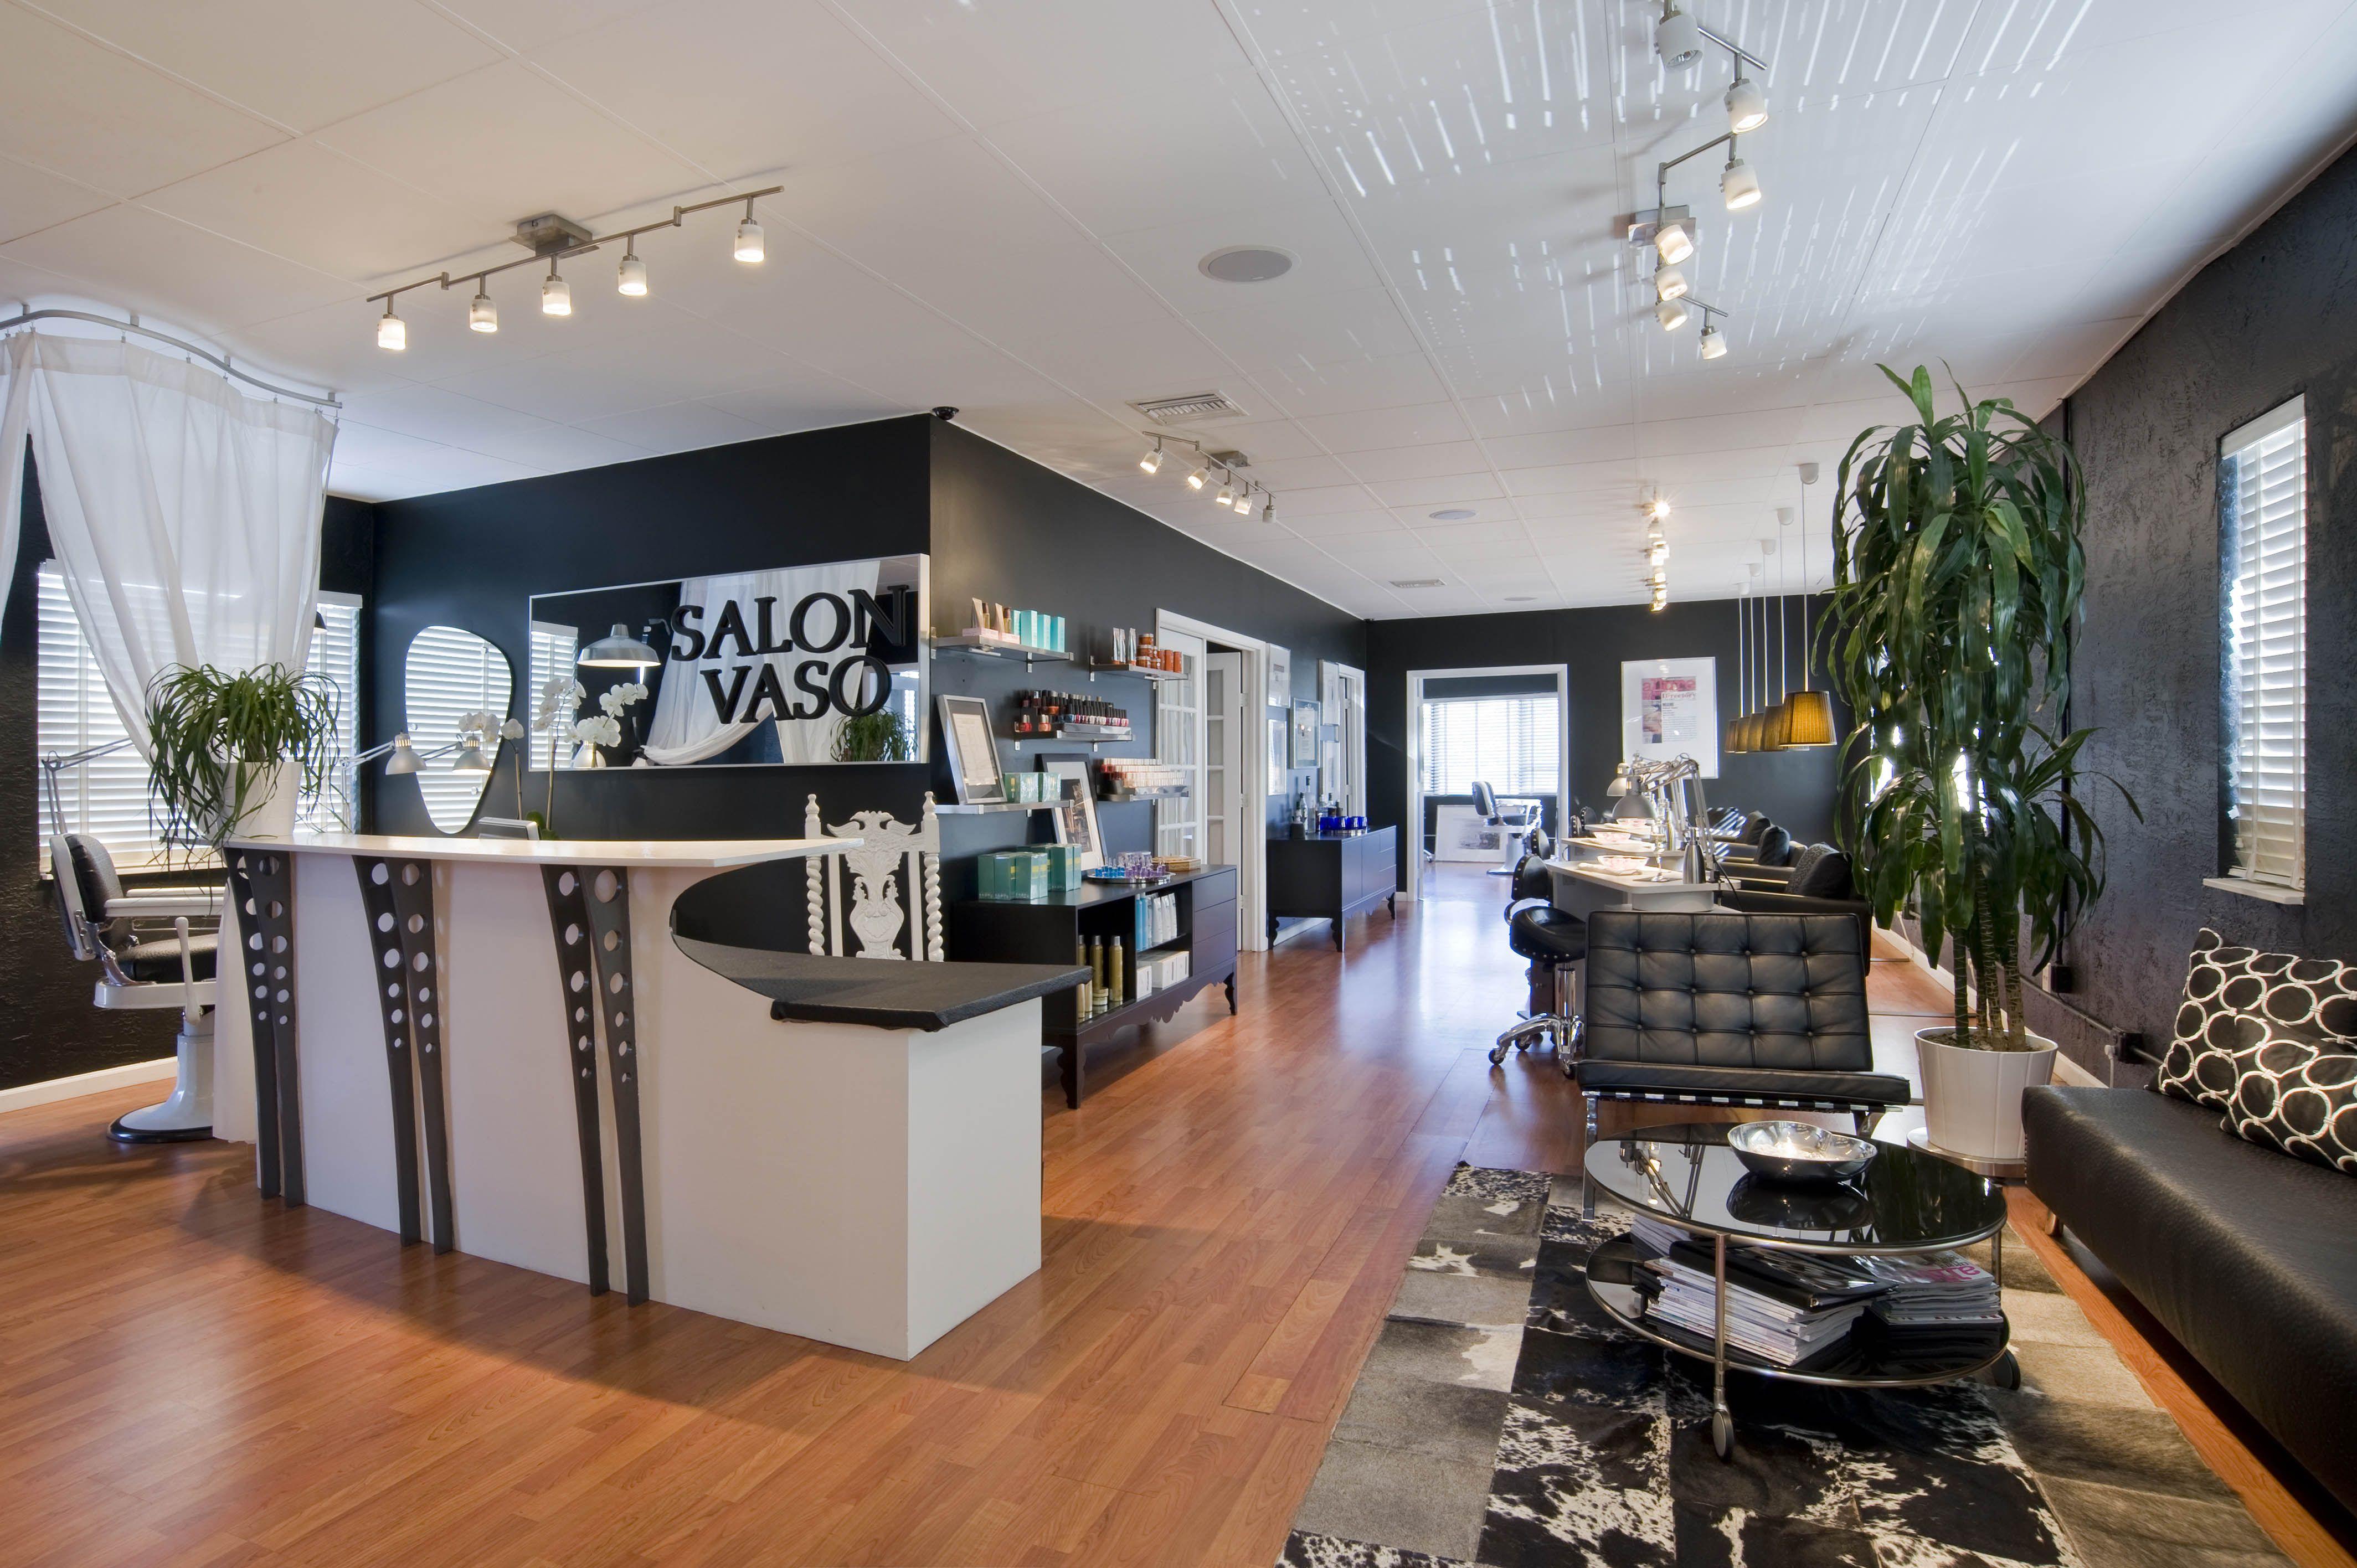 Our beautiful salon | Inside Salon Vaso | Pinterest | Deko ideen ...